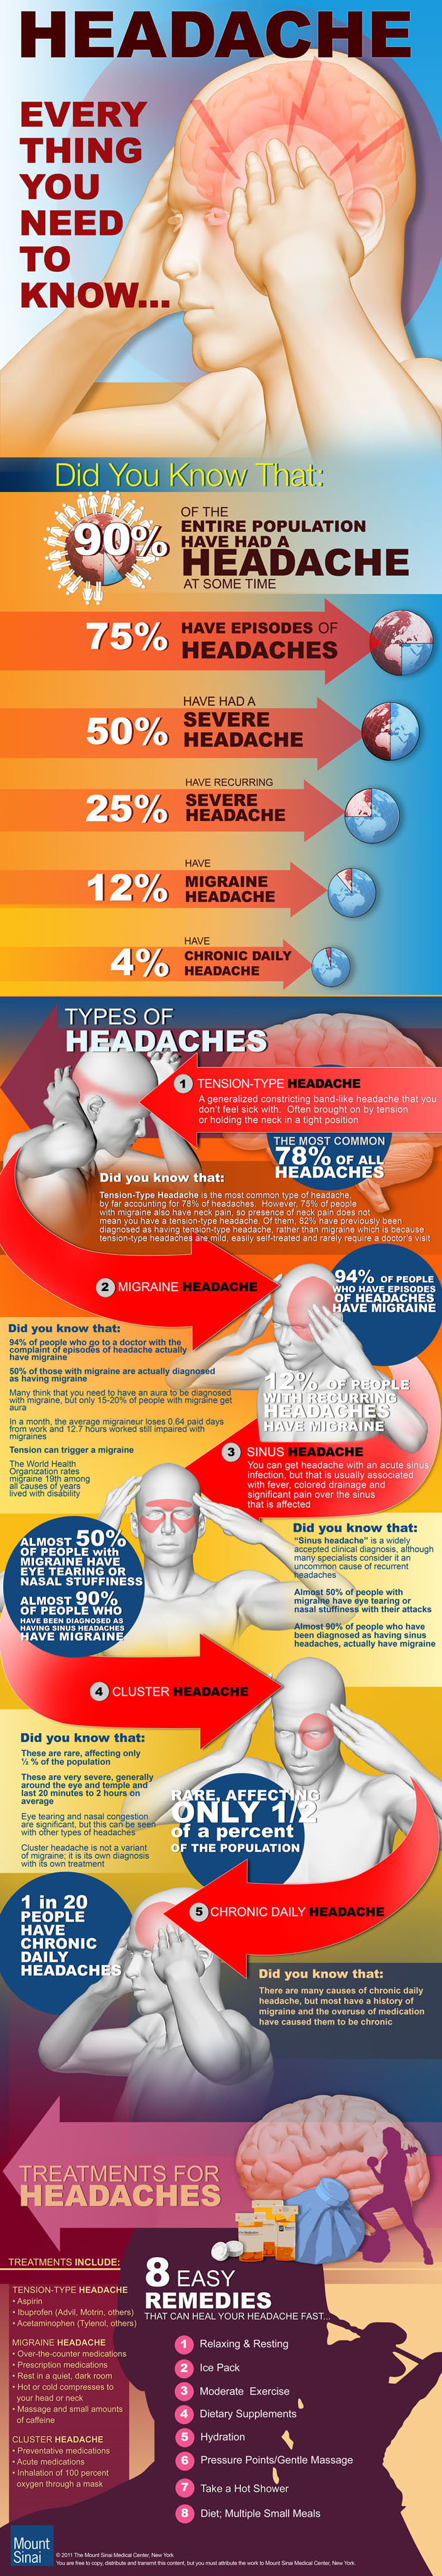 headaches infographic